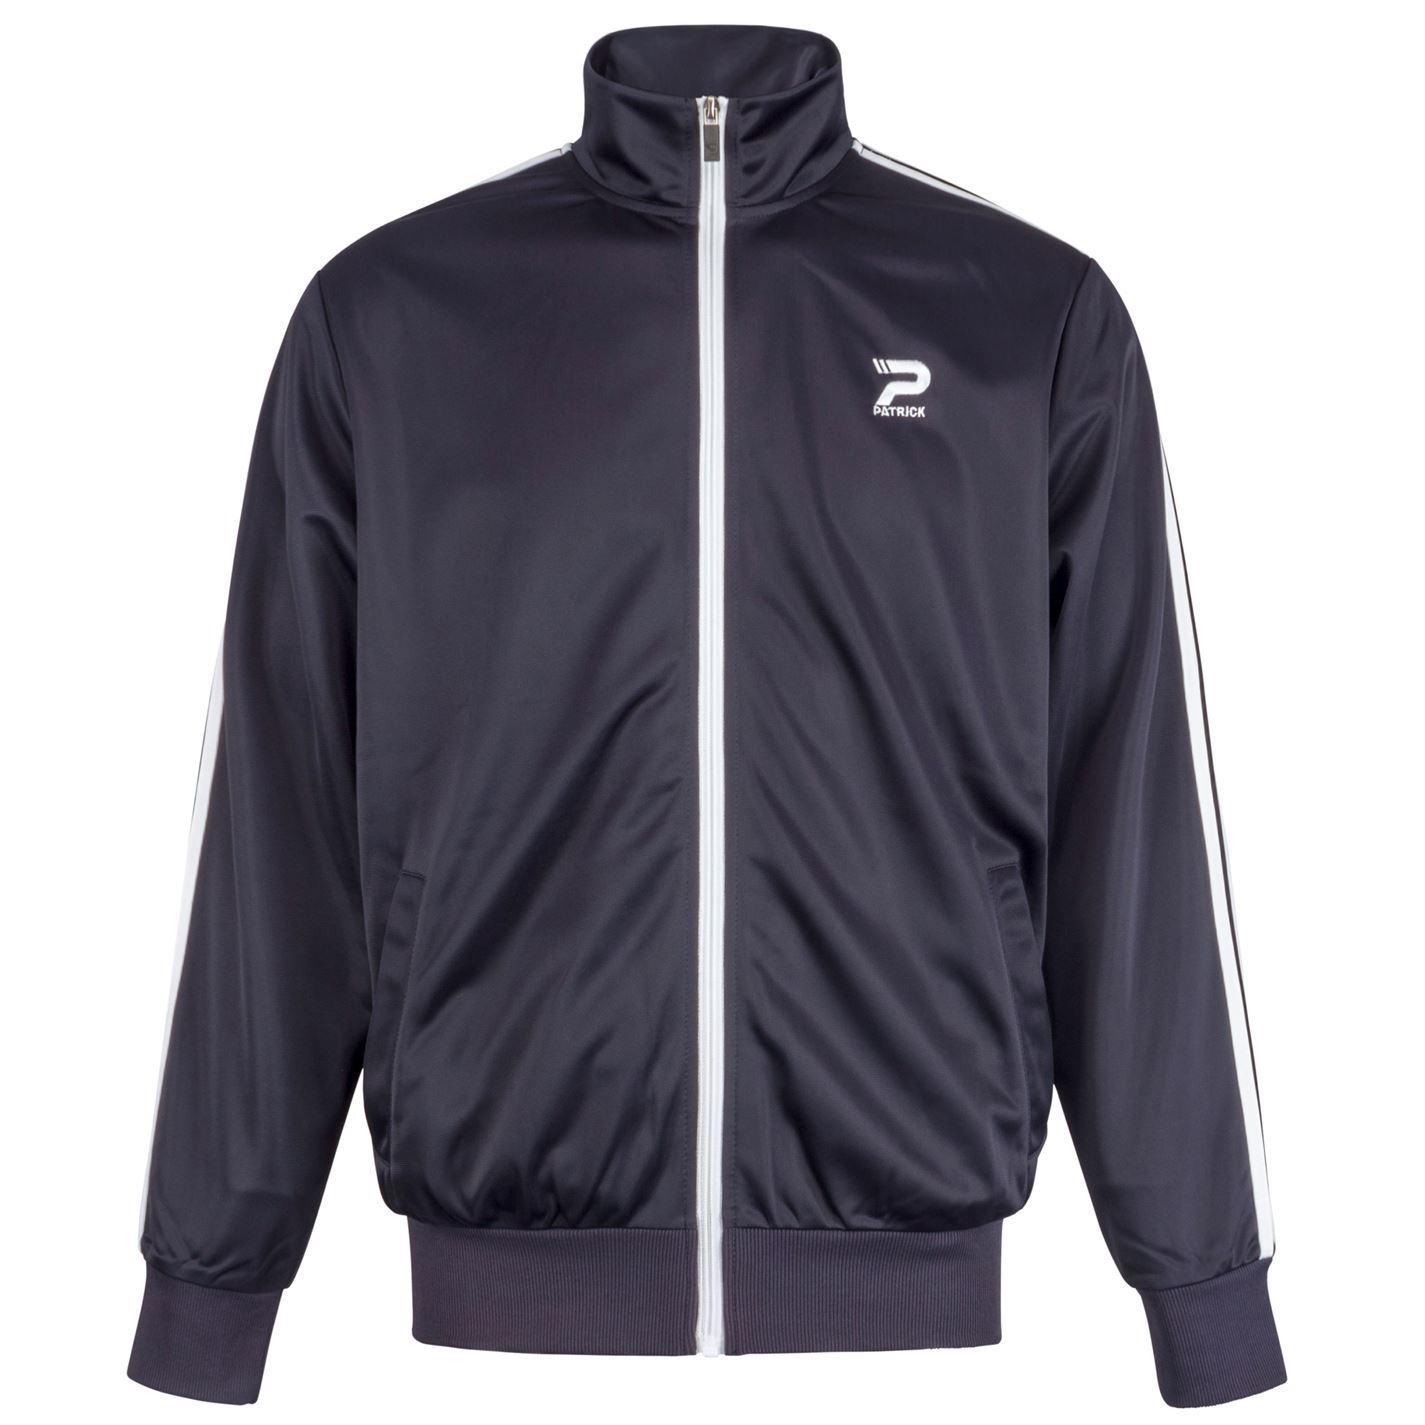 Patrick-Mens-Track-Jacket-Tracksuit-Top-Coat-Zip-Elasticated-Cuffs-Retro